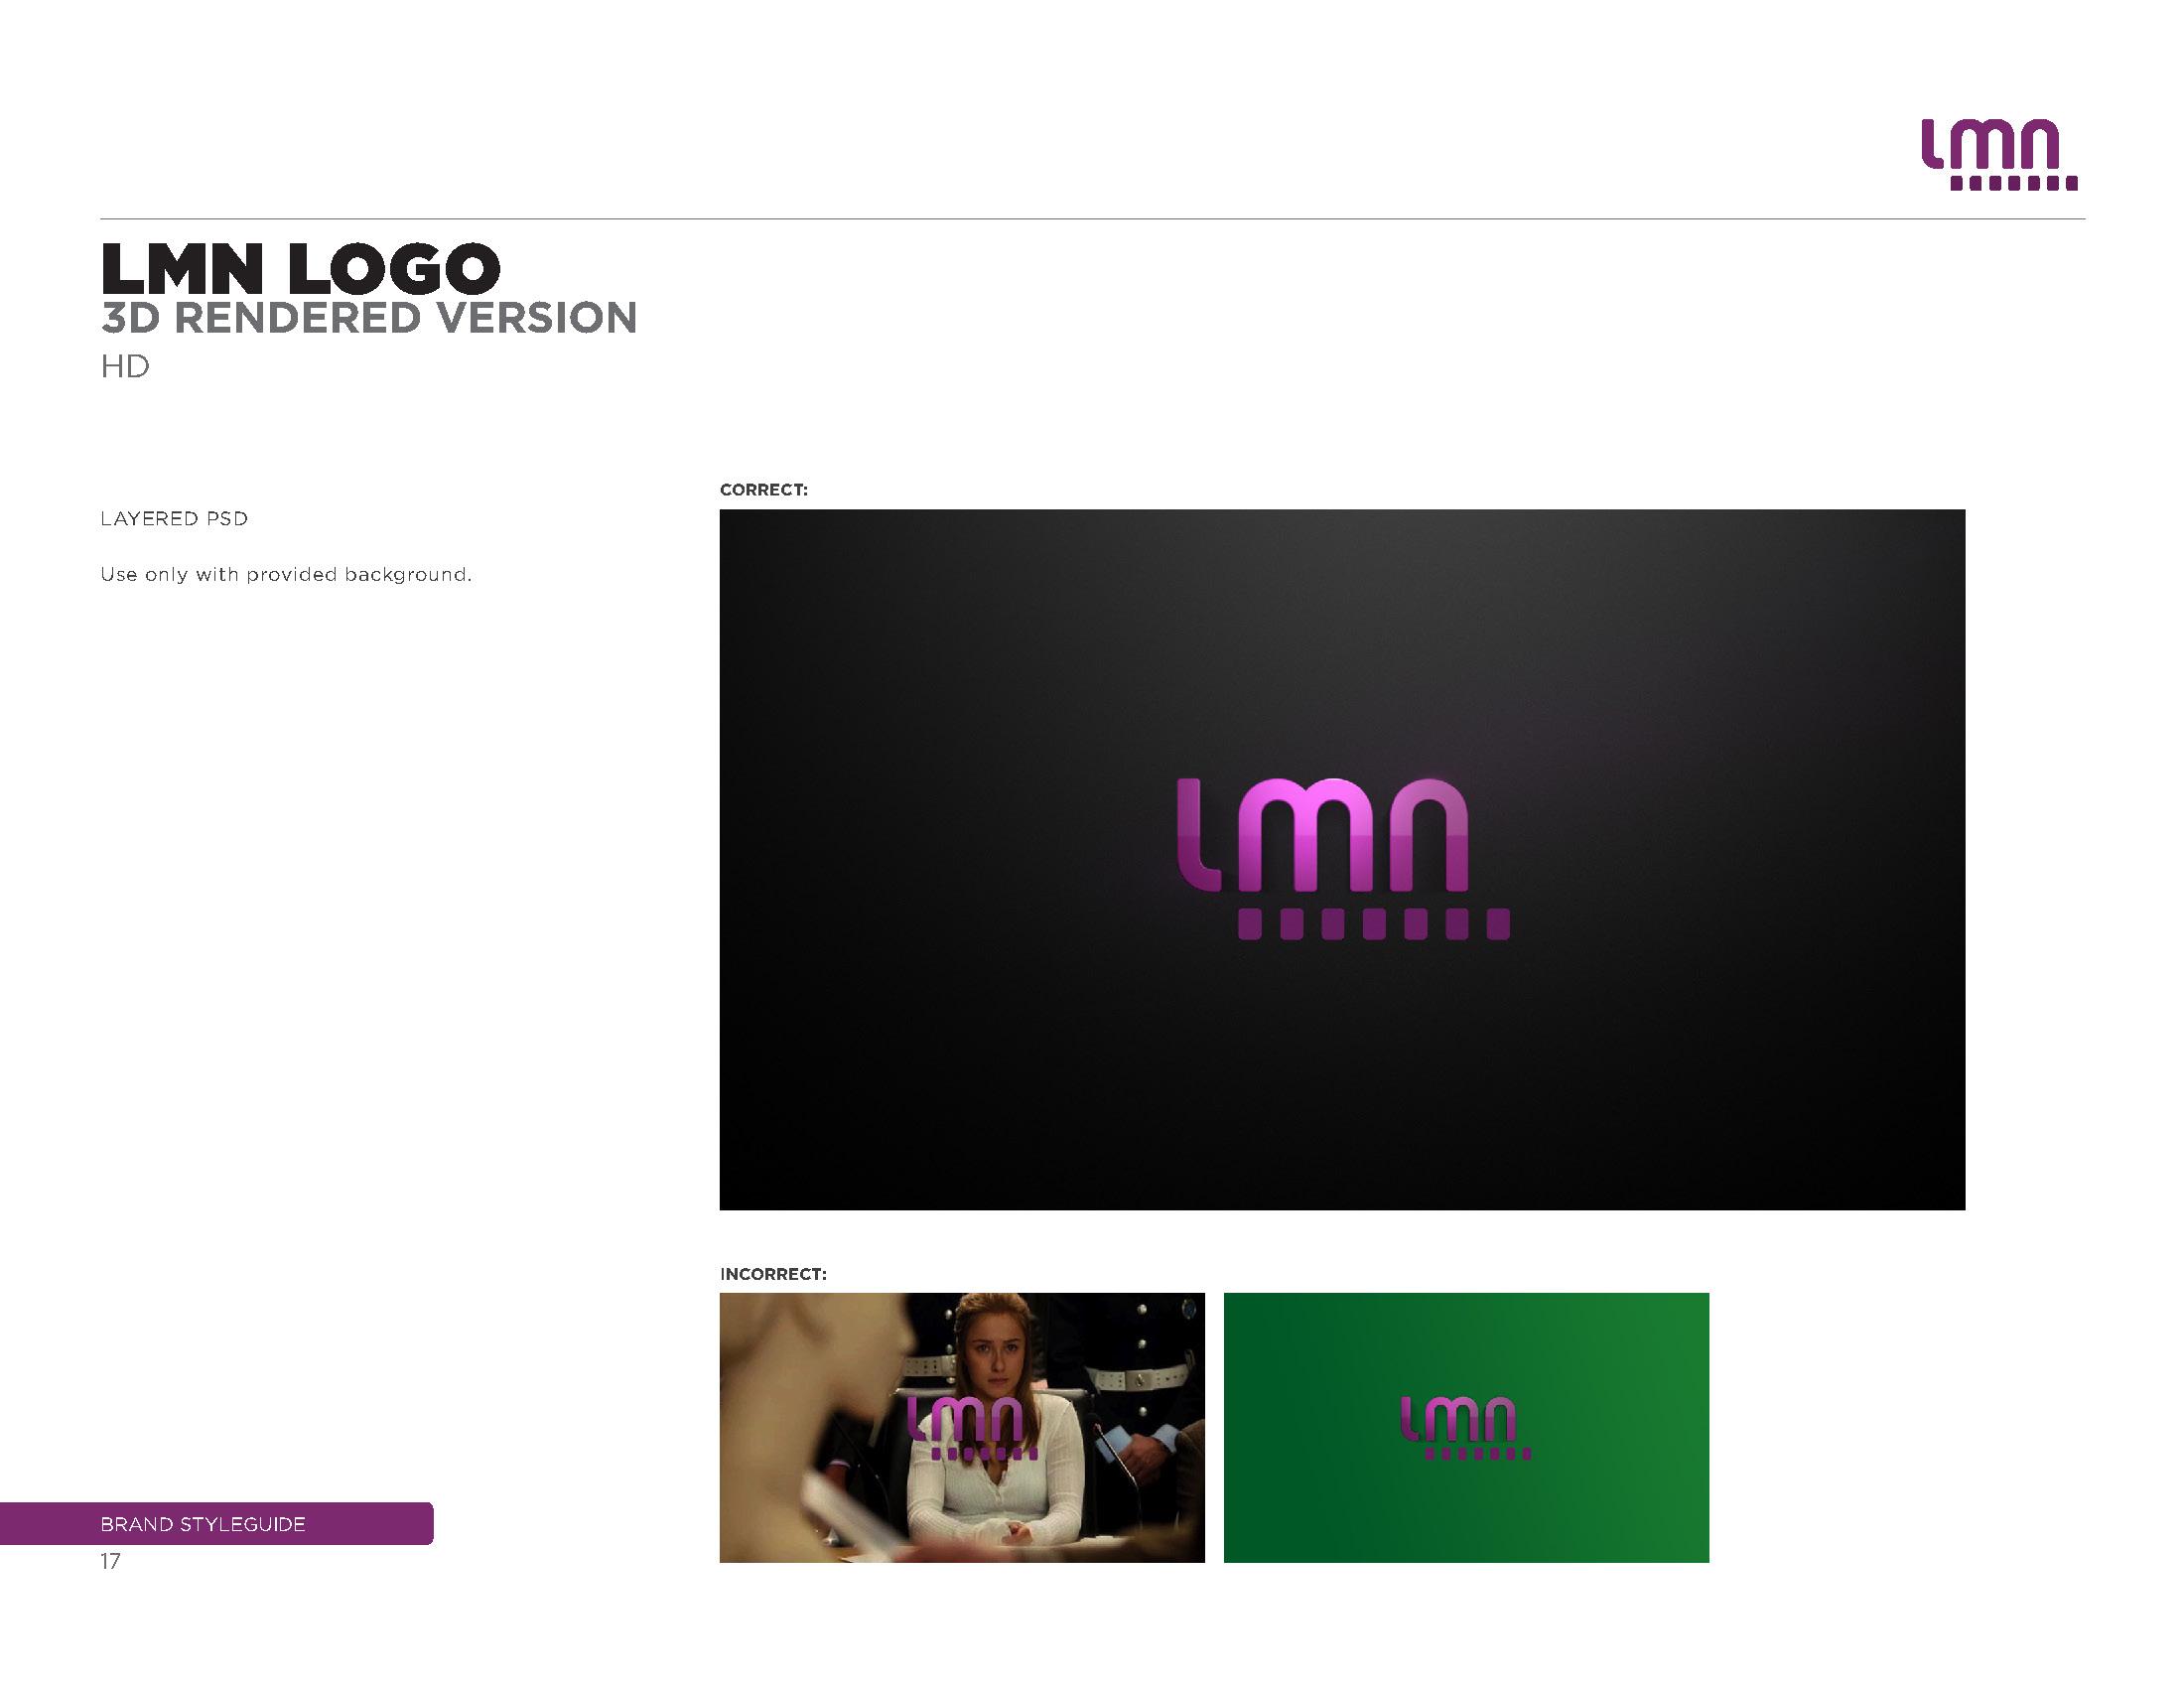 LMN_styleguide_092711_HQ_Page_17.jpg